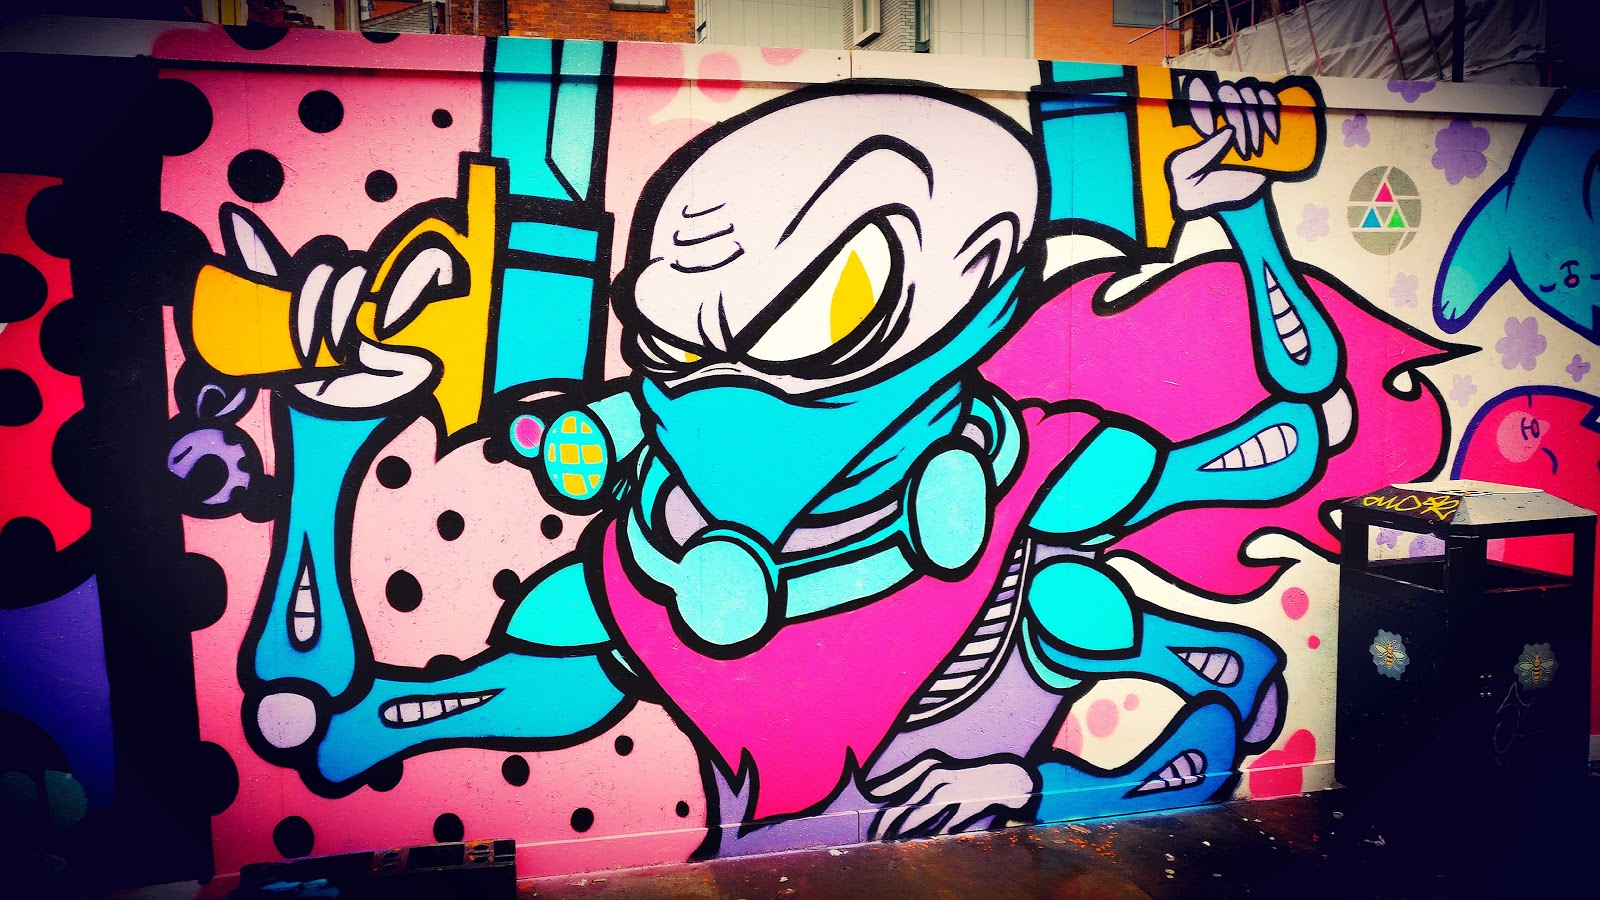 Genestealer Cult Graffiti Wargaming Hub